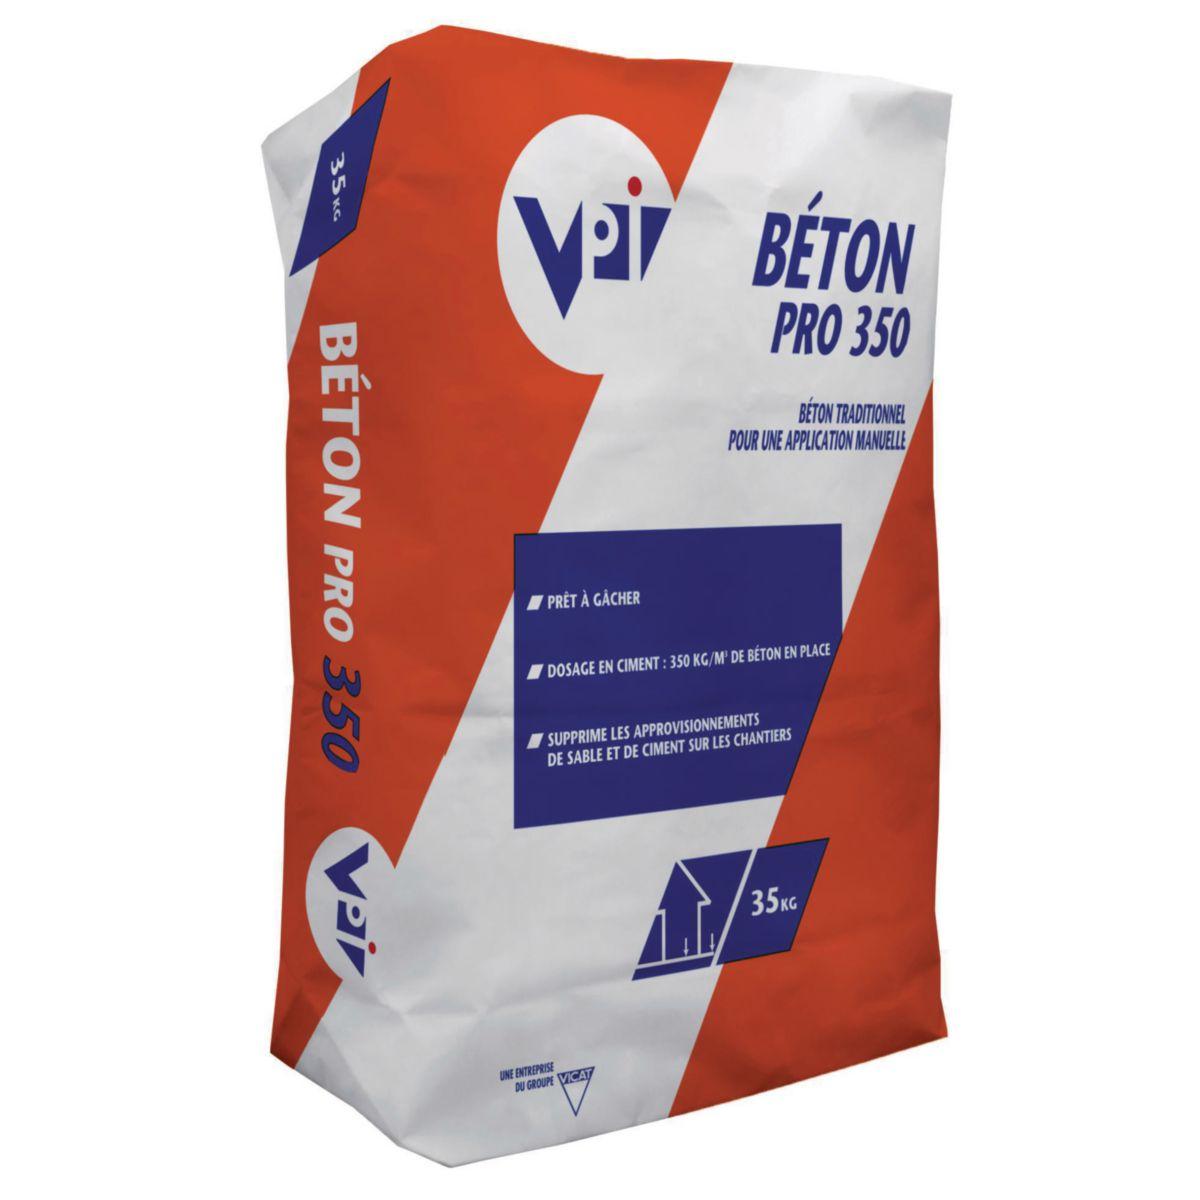 Bton drainant en sac awesome excellent mortier allg polys - Sac beton pret al emploi ...